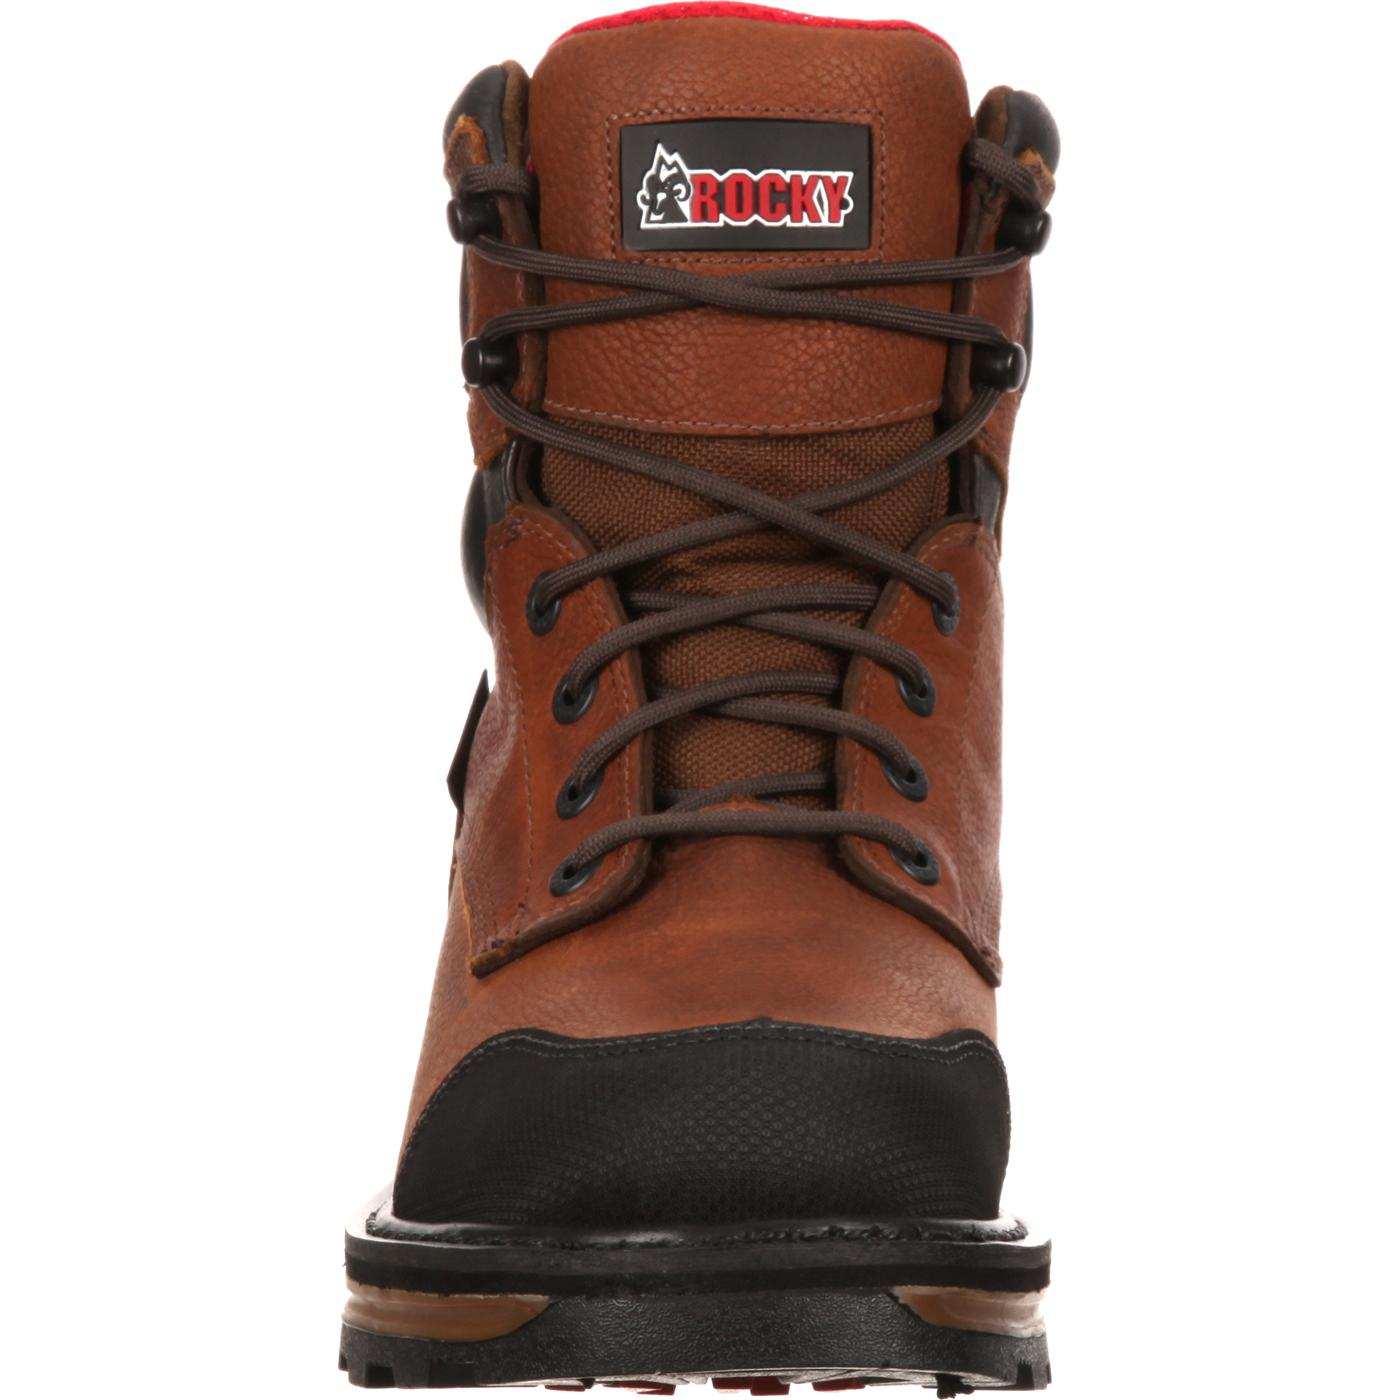 5053cffdcae Rocky Elements Dirt Steel Toe Waterproof Work Boot